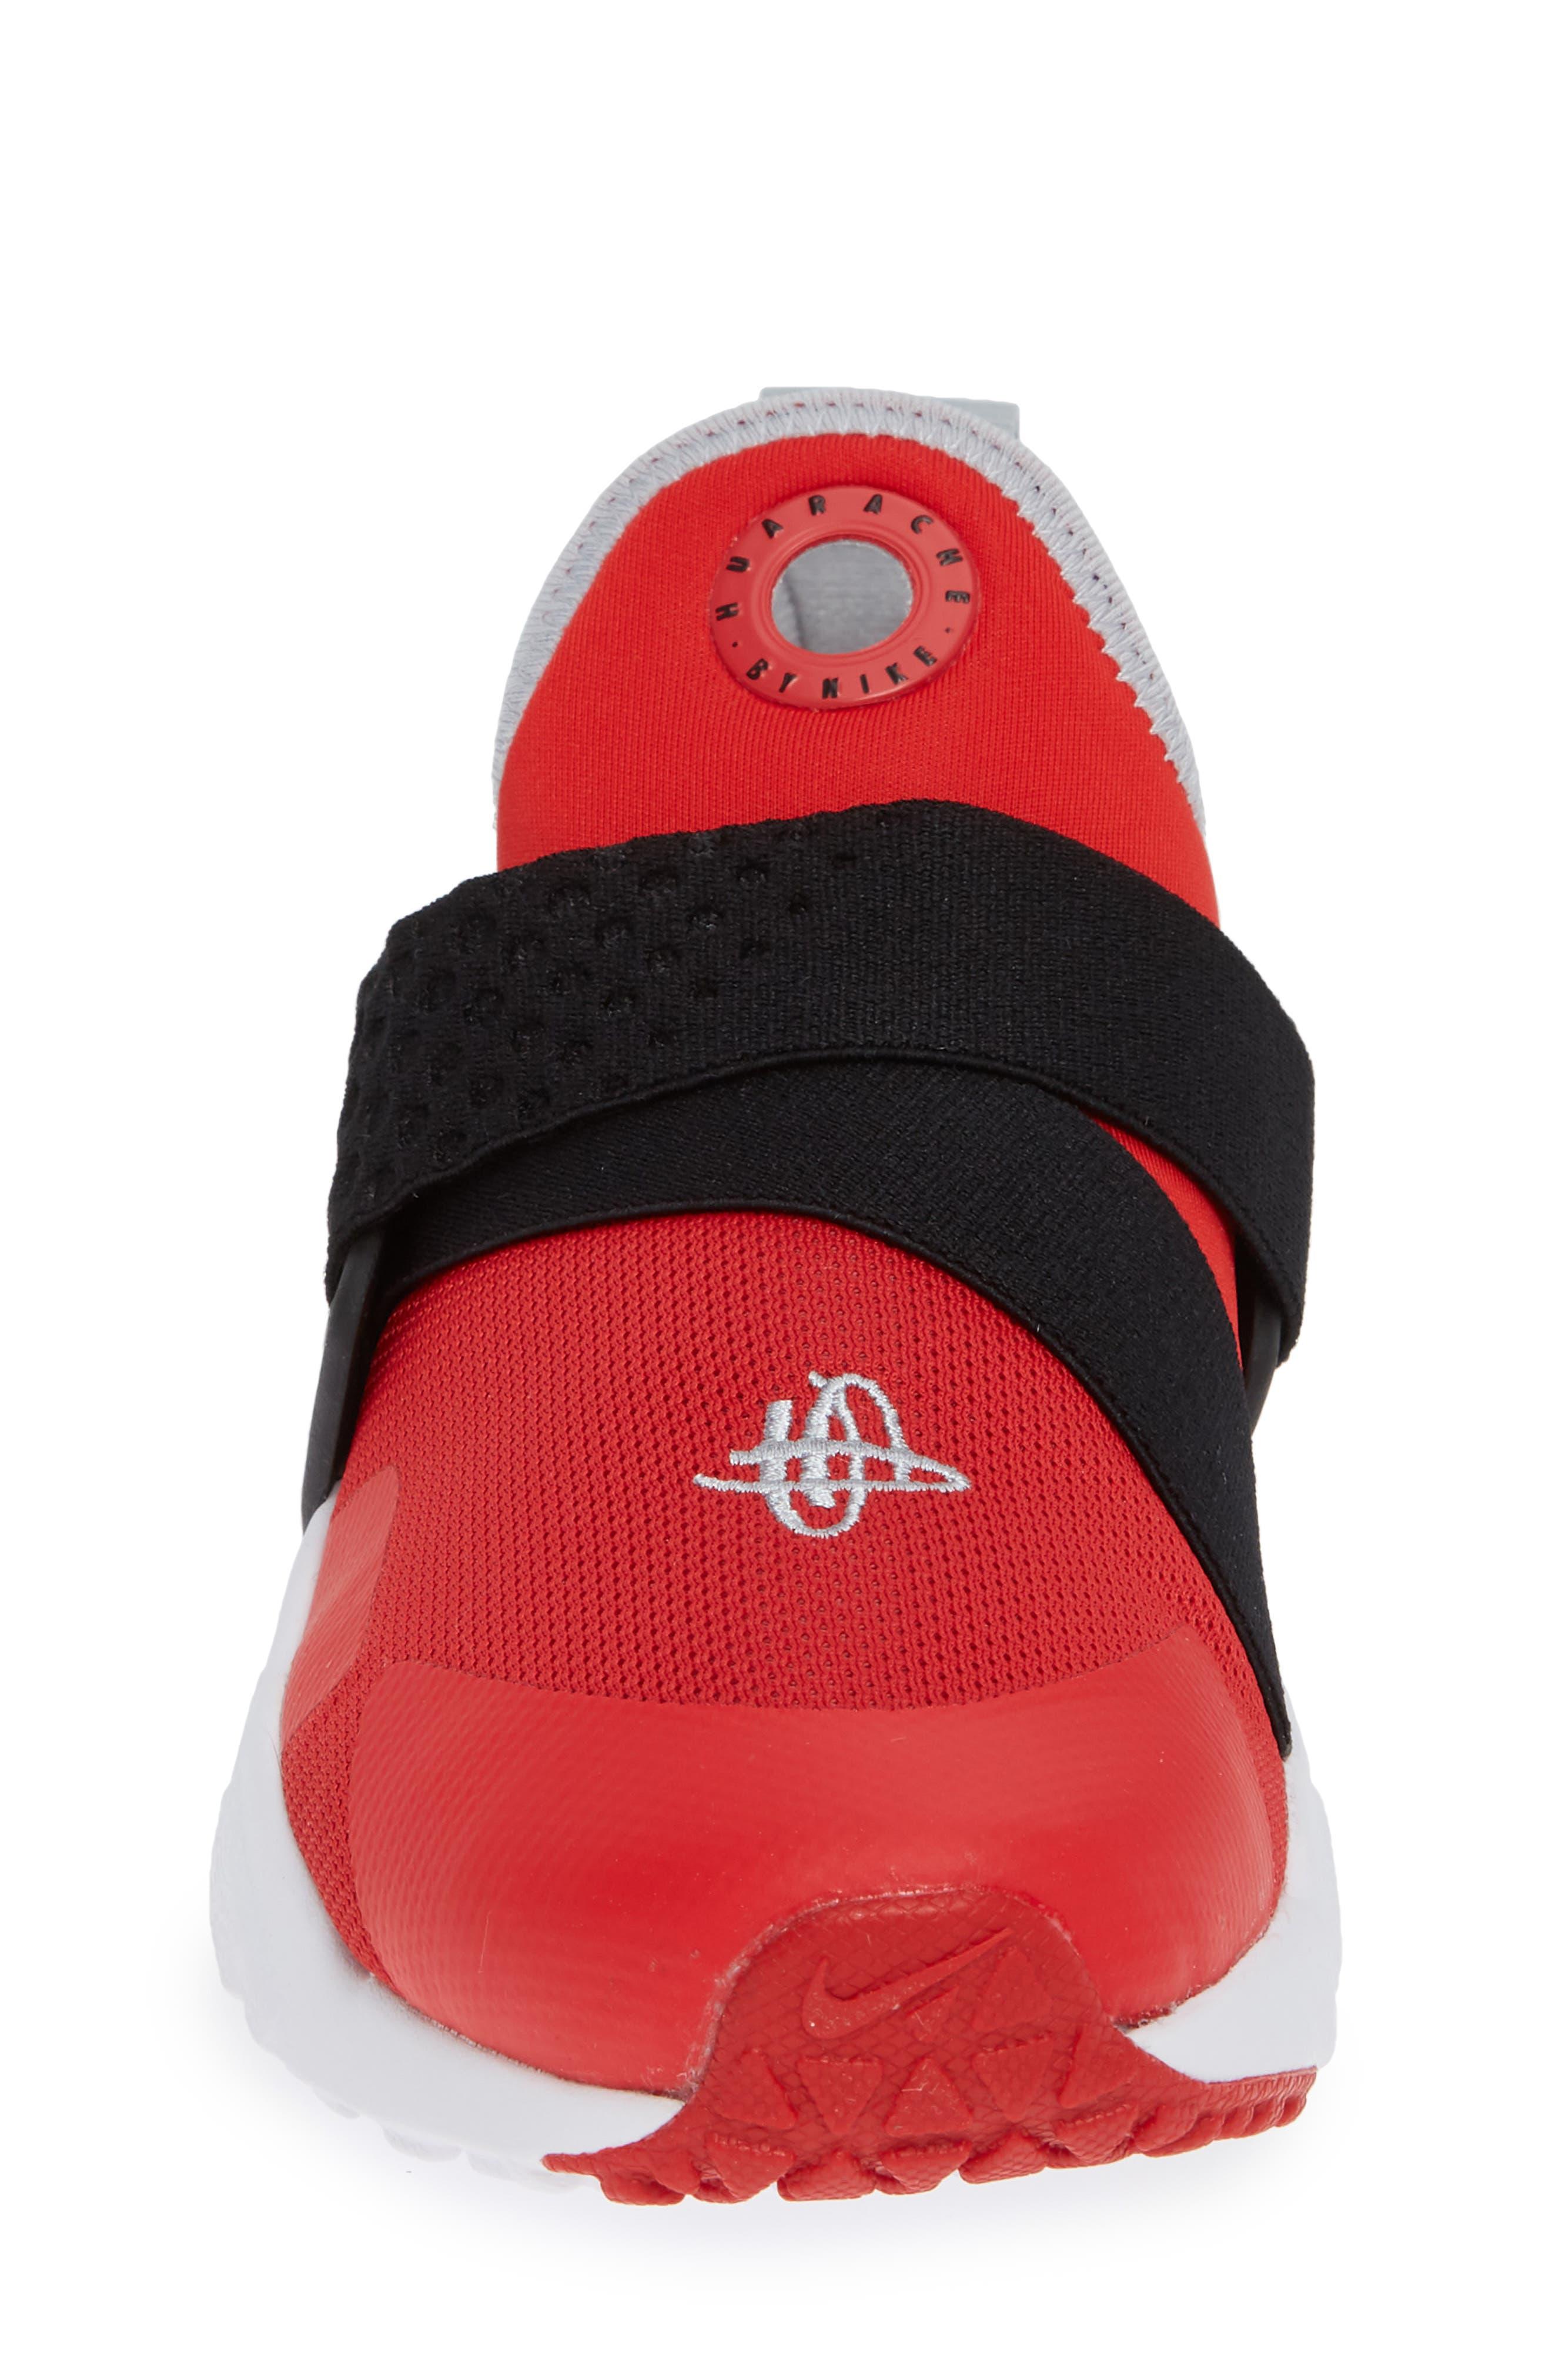 Huarache Extreme Sneaker,                             Alternate thumbnail 4, color,                             RED/ GREY/ BLACK/ WHITE